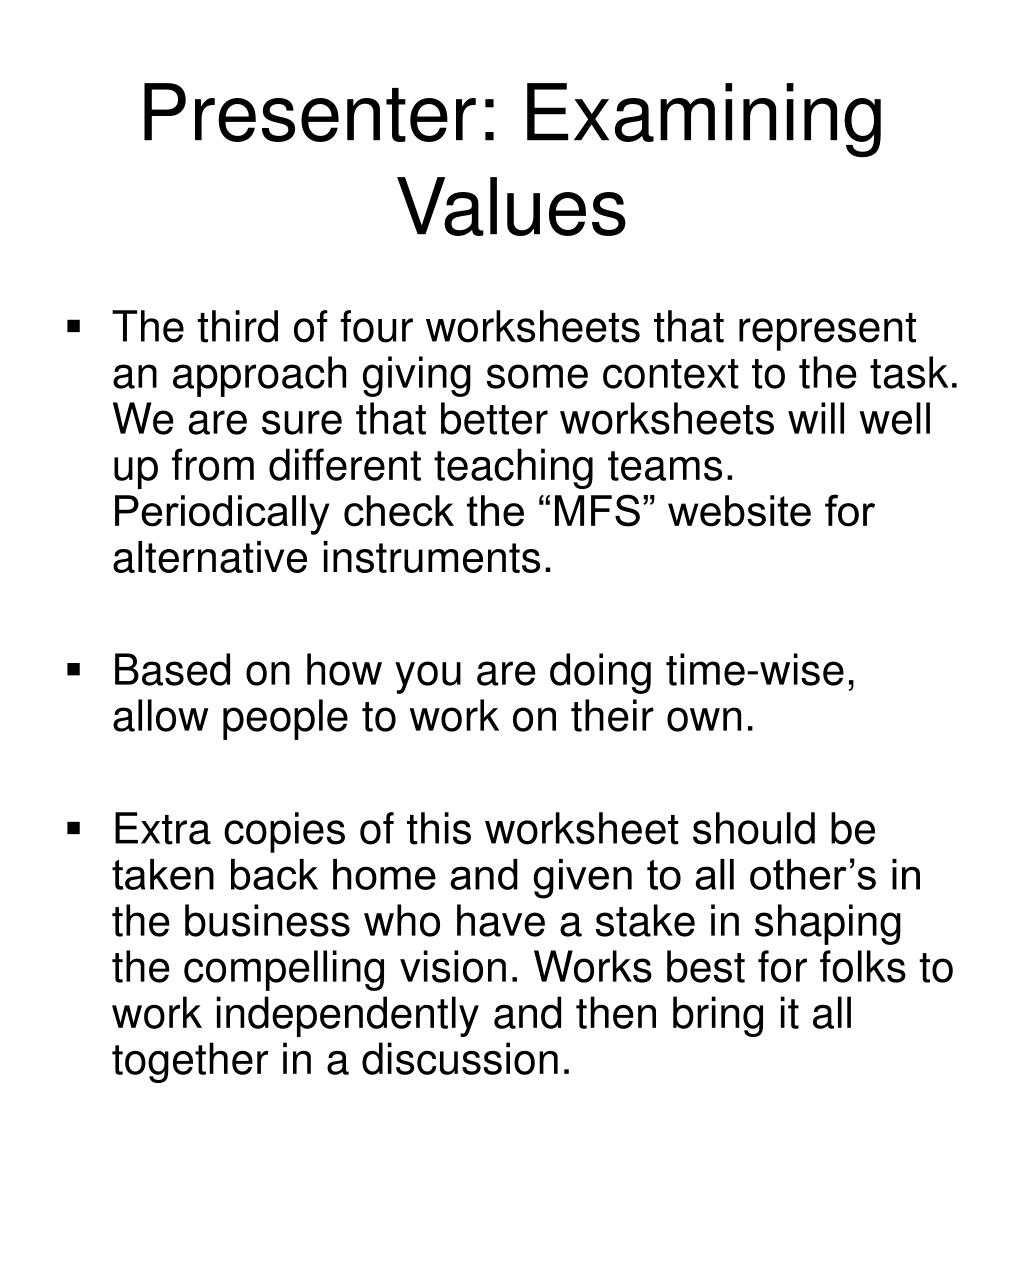 Presenter: Examining Values